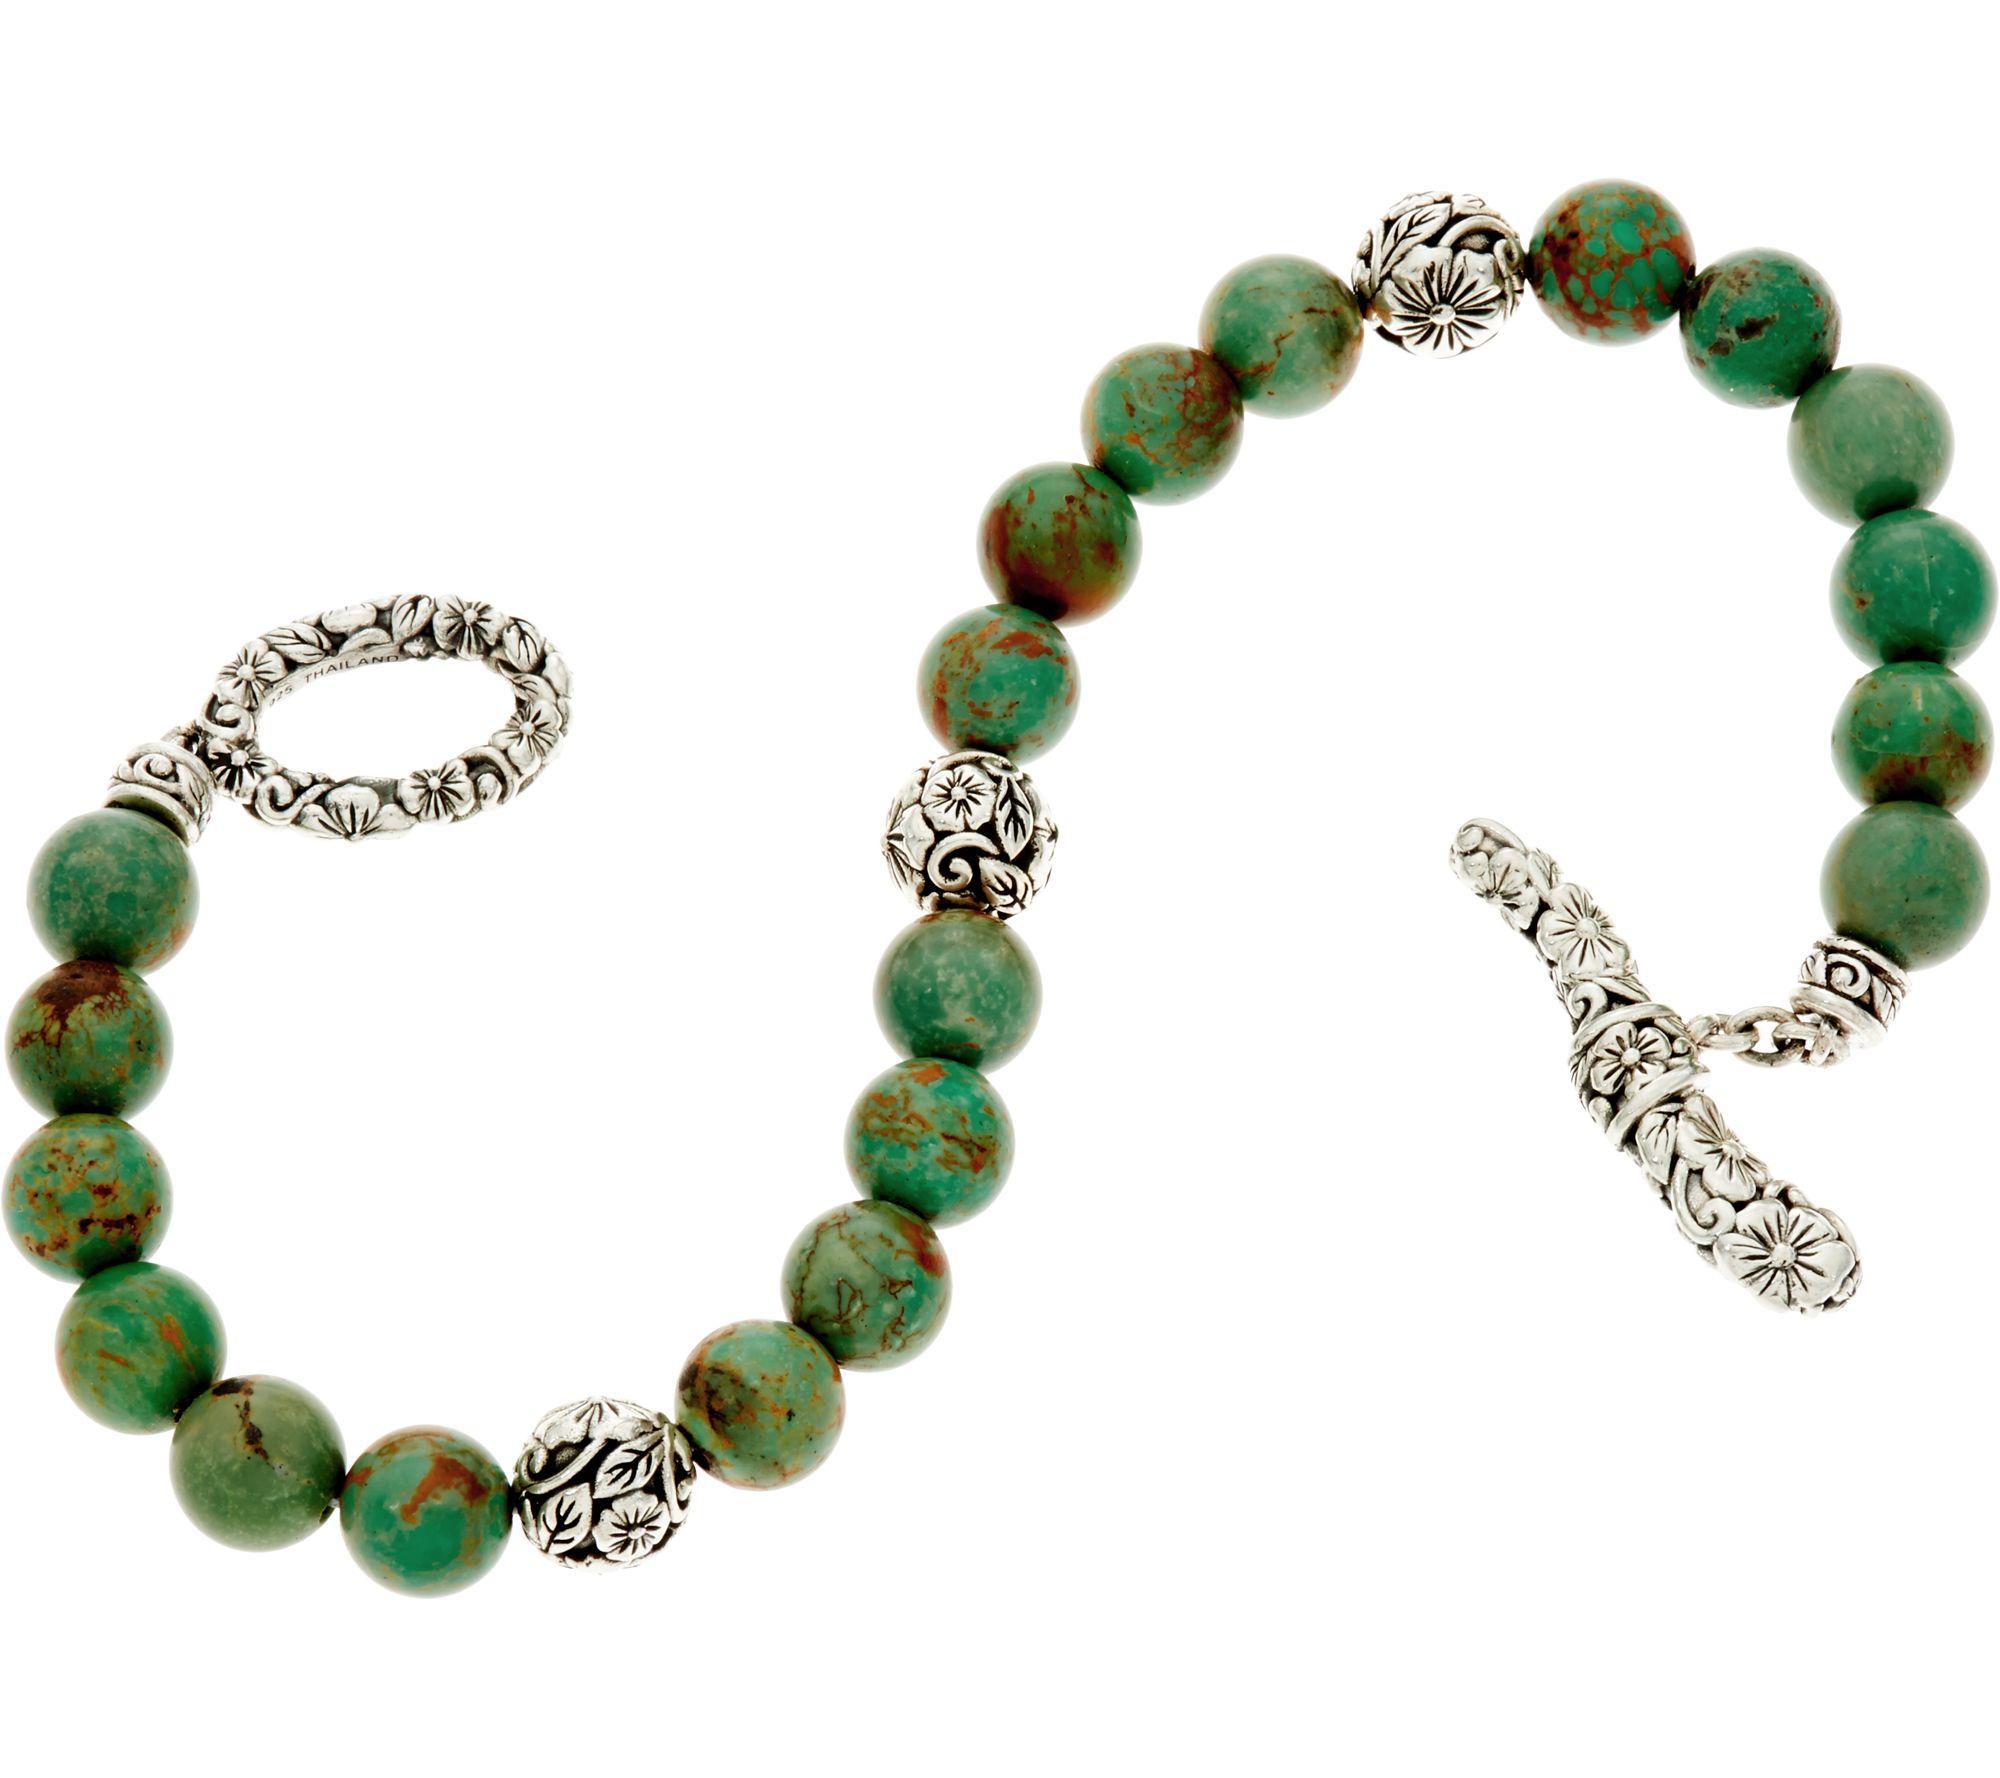 Jai Sterling Silver Carved Fl Turquoise Bead Bracelet J348409